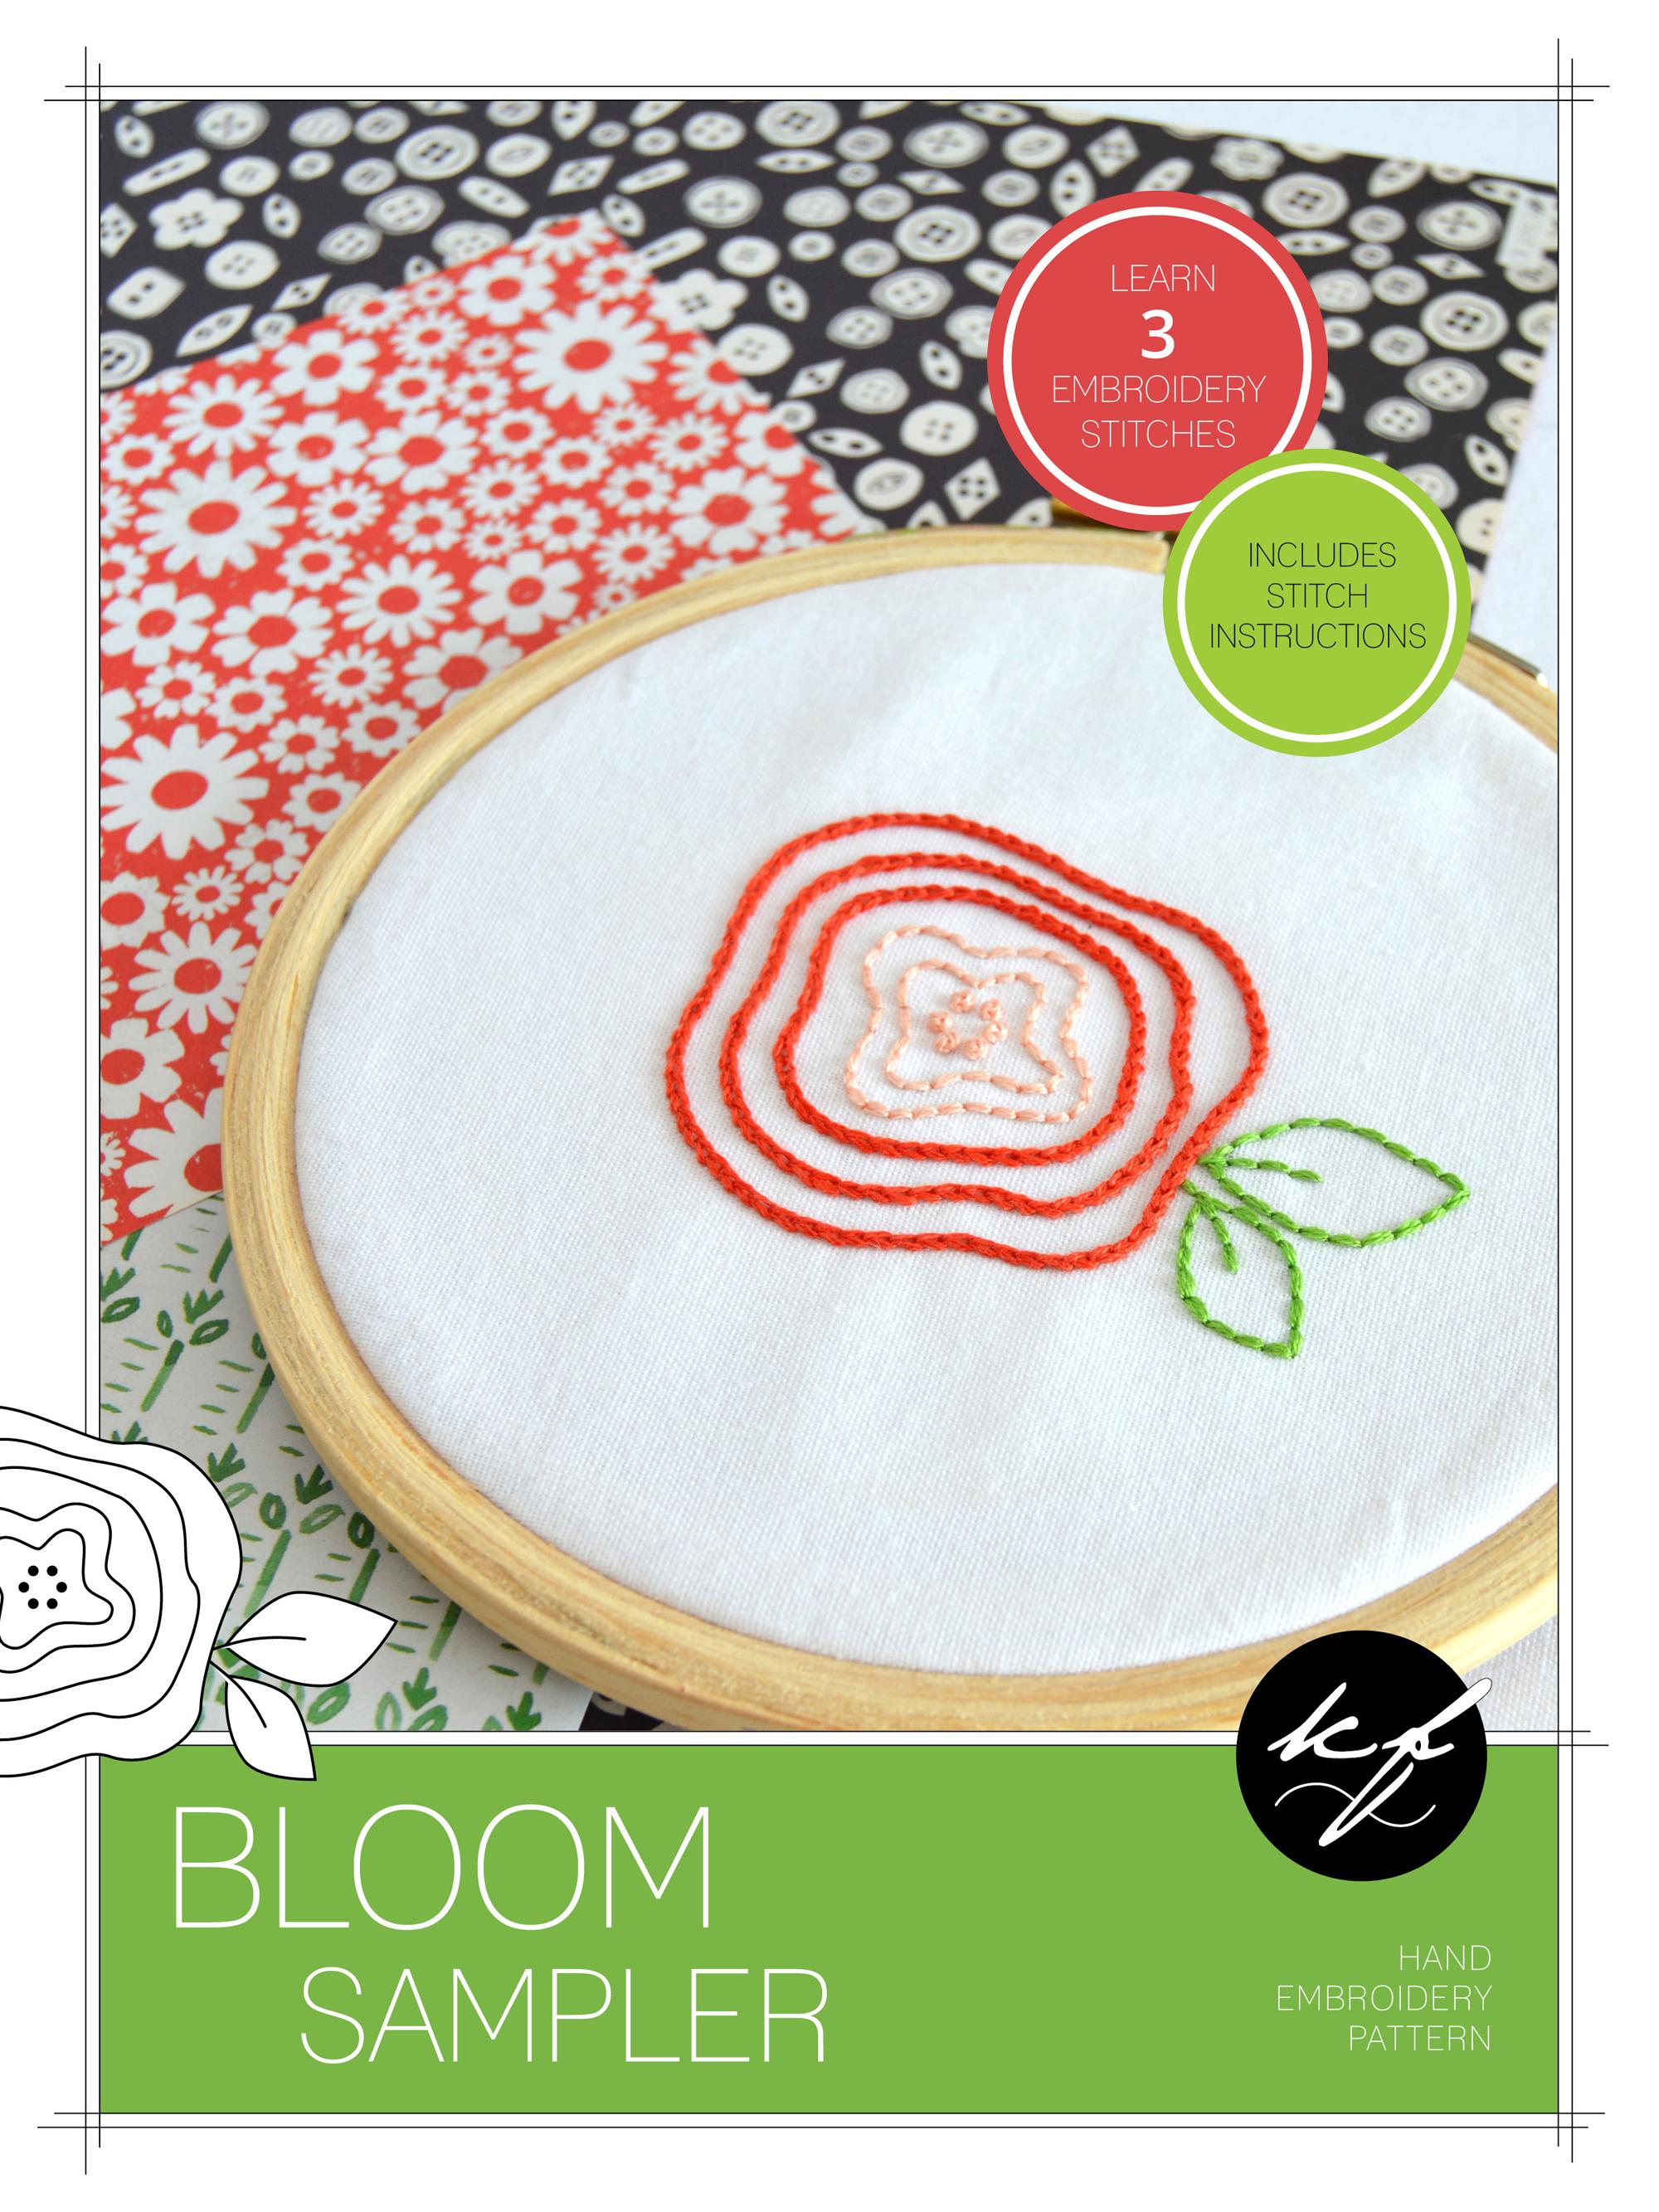 BloomSamplerEmbroideryPattern_KellyFletcher.jpg